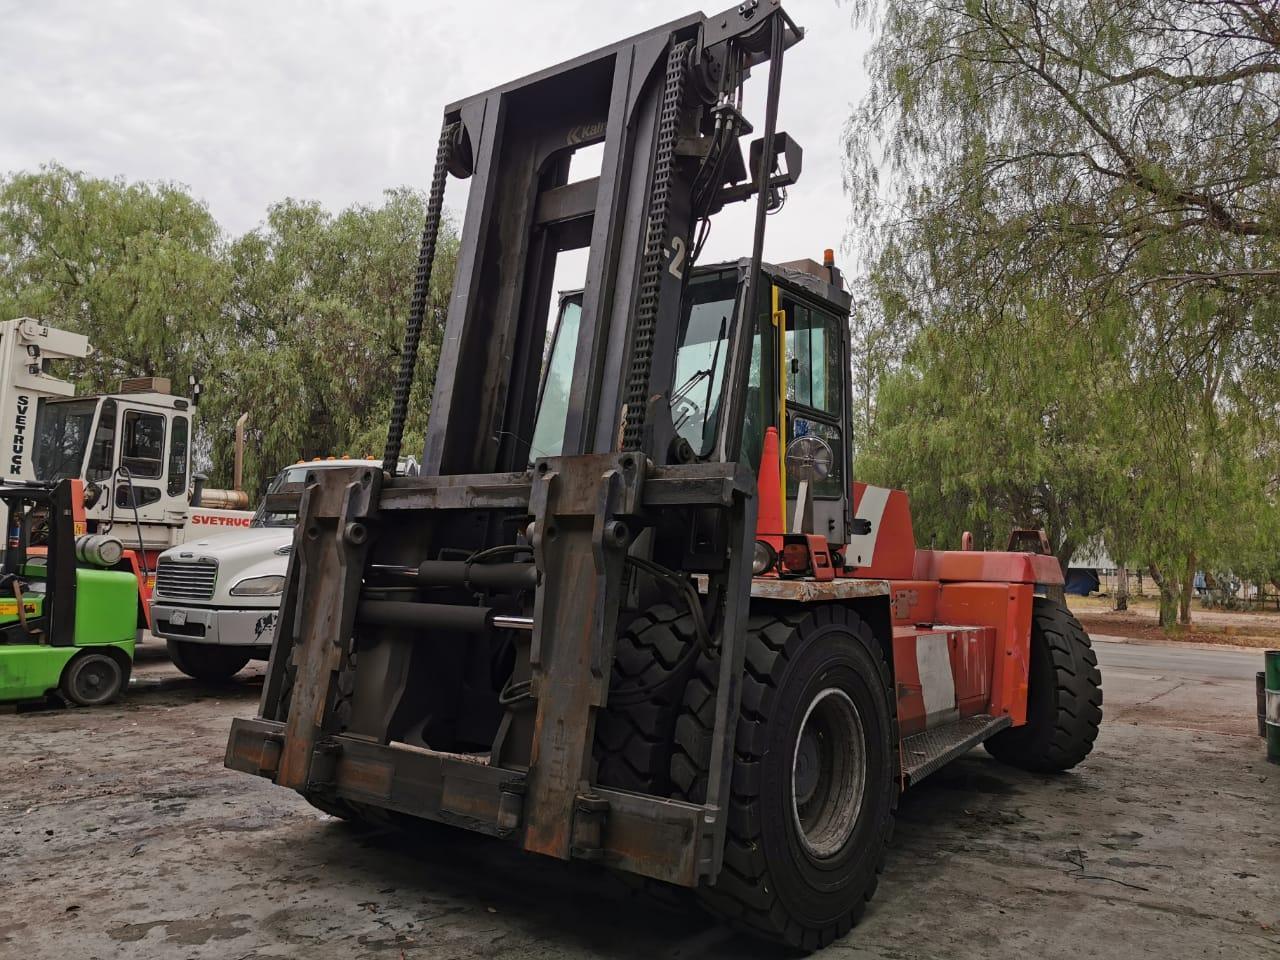 25 Ton Kalmar Forklift / Coil Lift Truck- Year 2009 K2